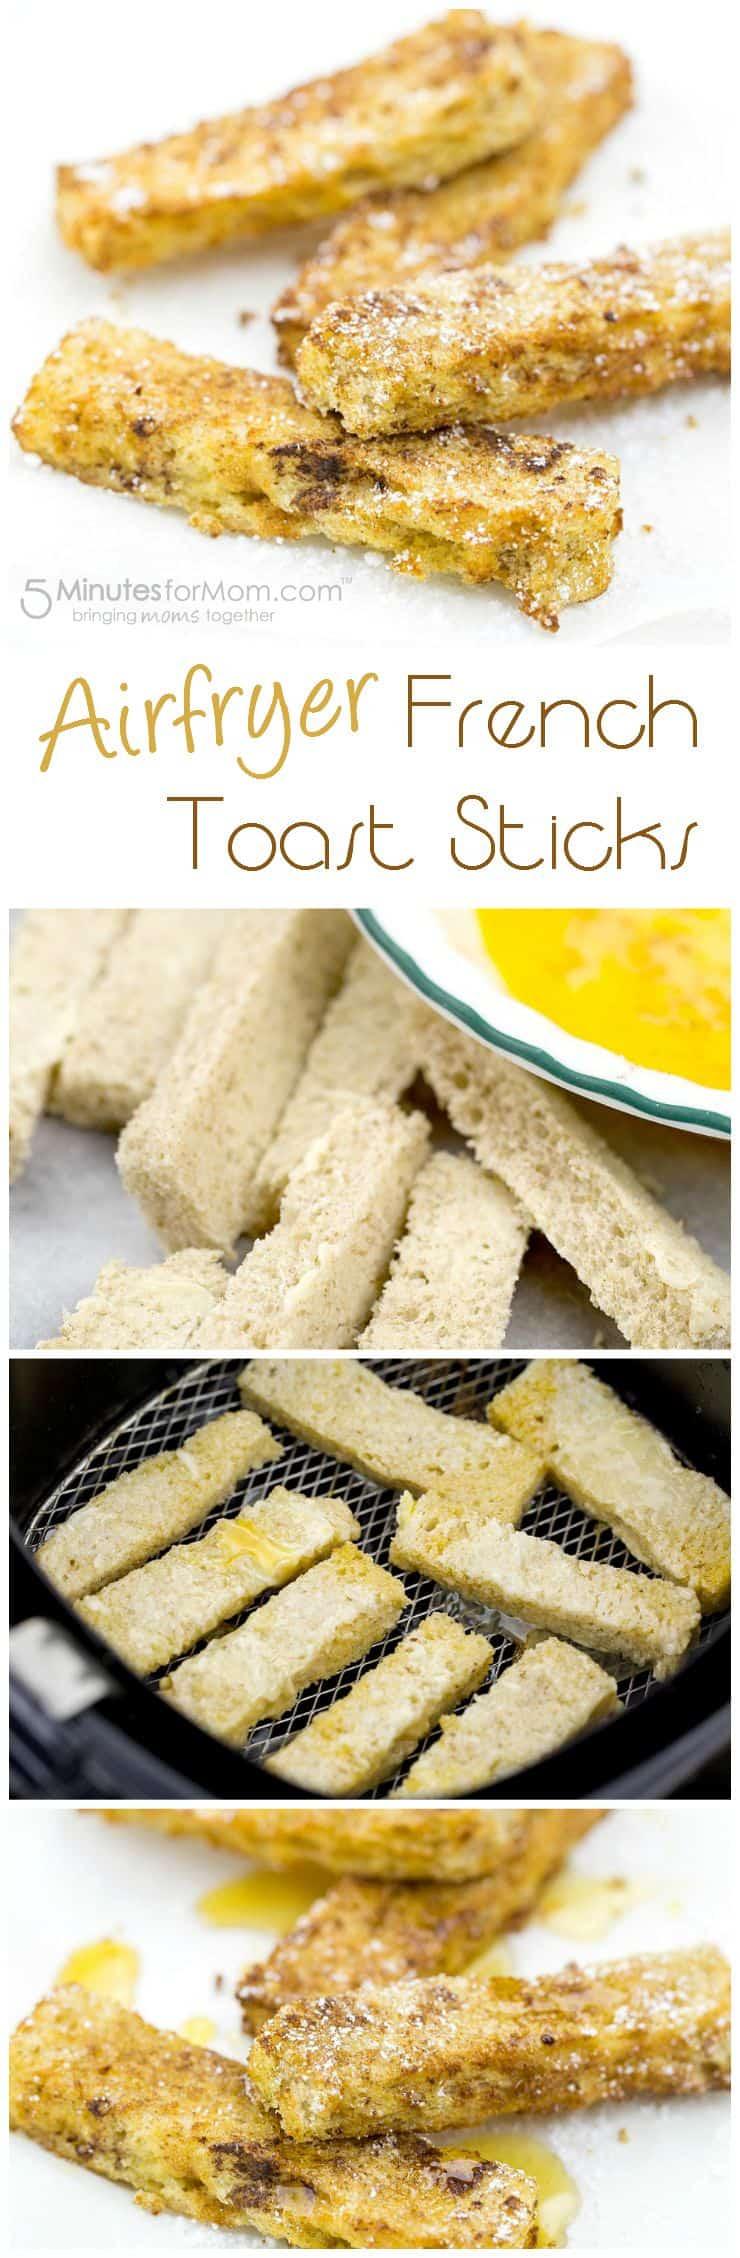 Airfryer French Toast Sticks Collage